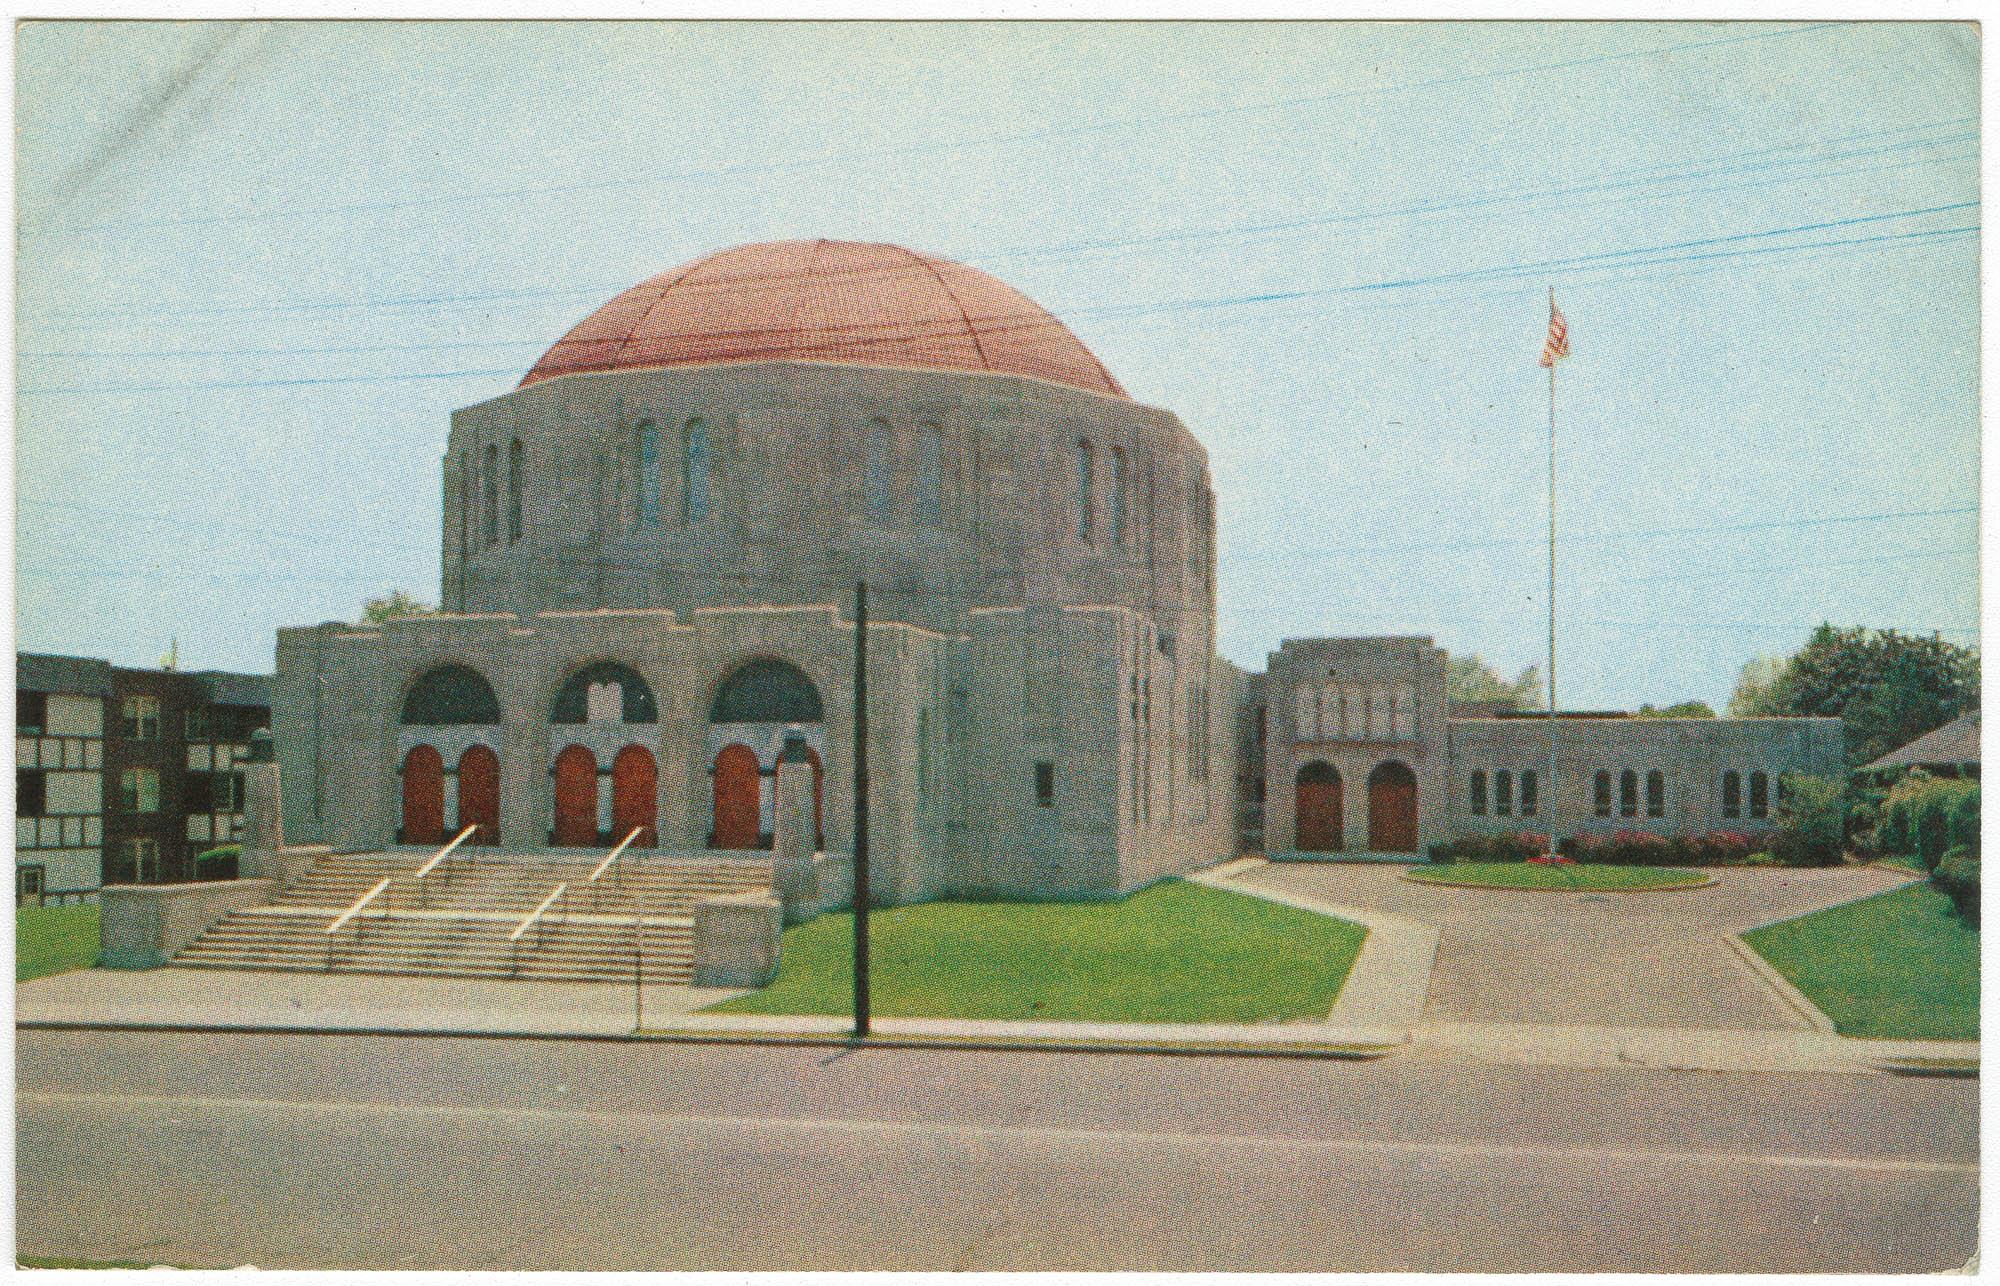 Temple Beth Israel and Silberman Memorial Chapel, Hartford, Conn.